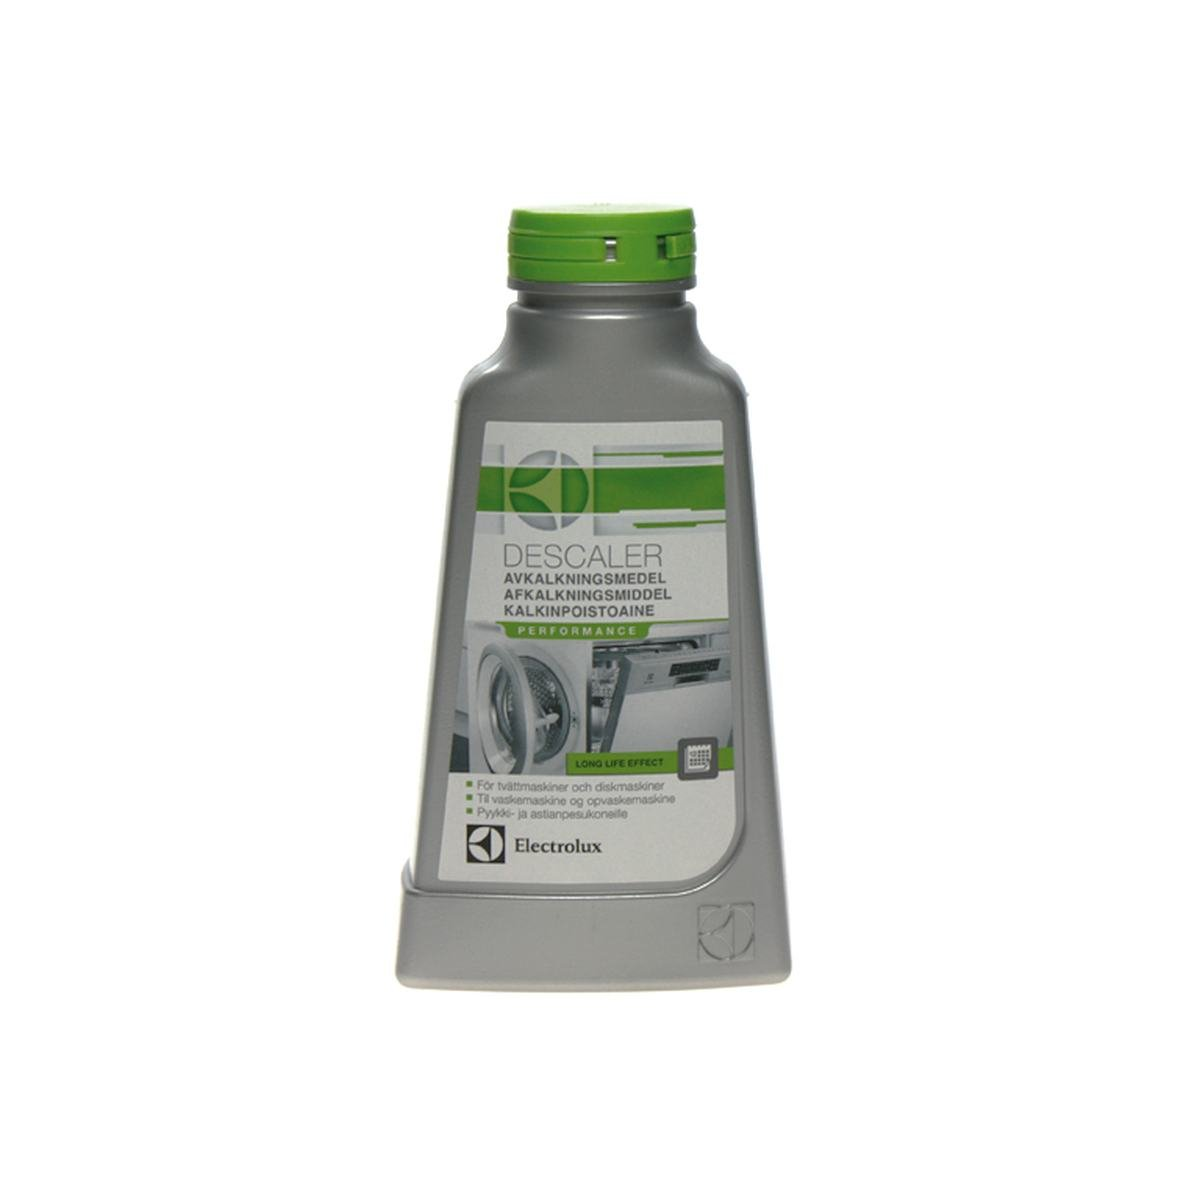 Avkalkningsmiddel  200 gram - Electrolux